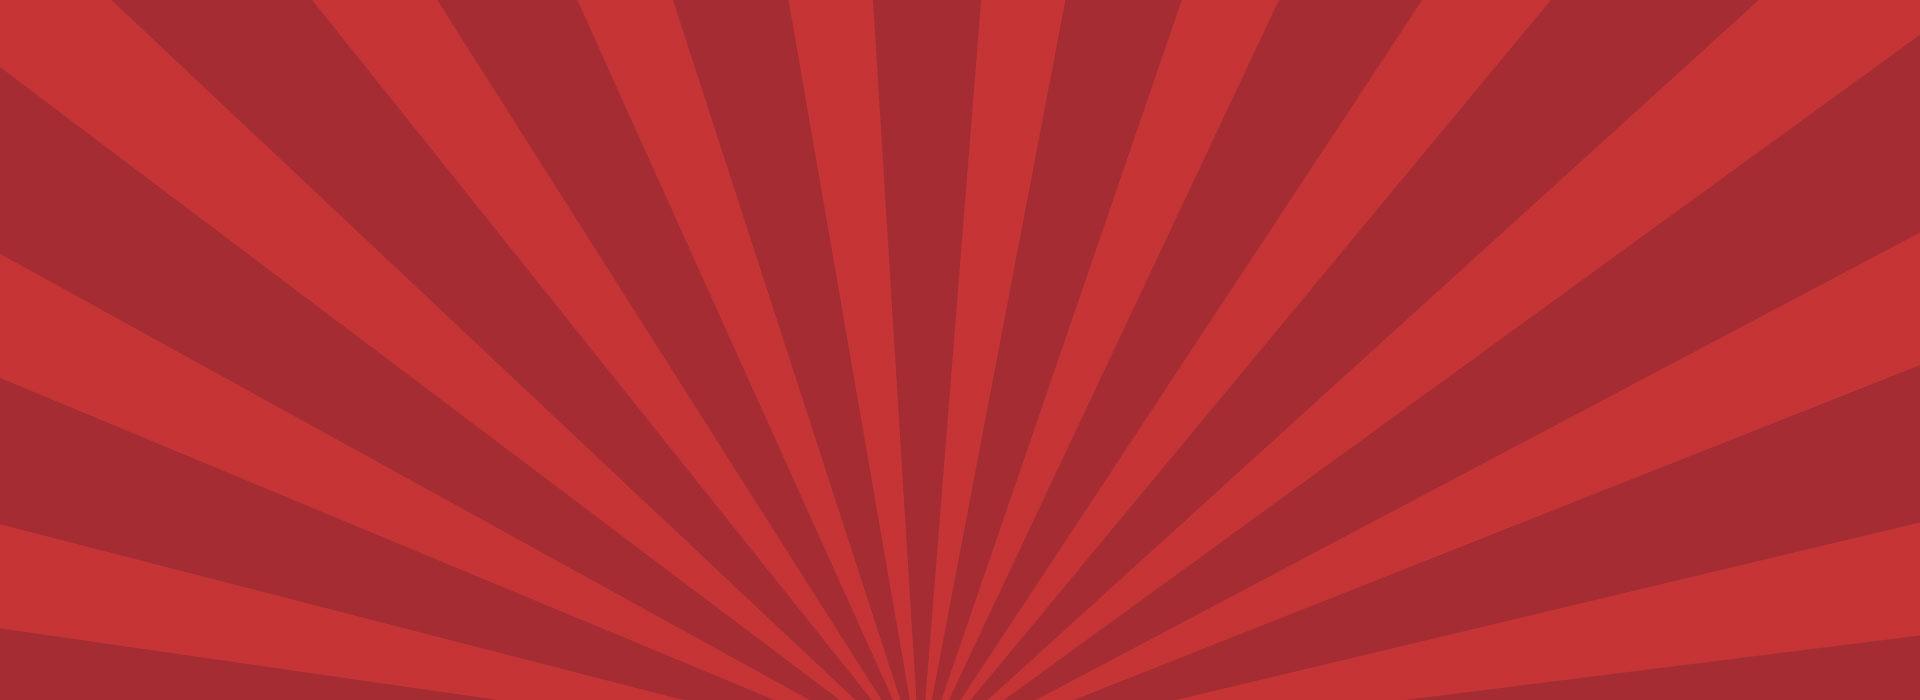 Banner background vCard GeekDimm Designs